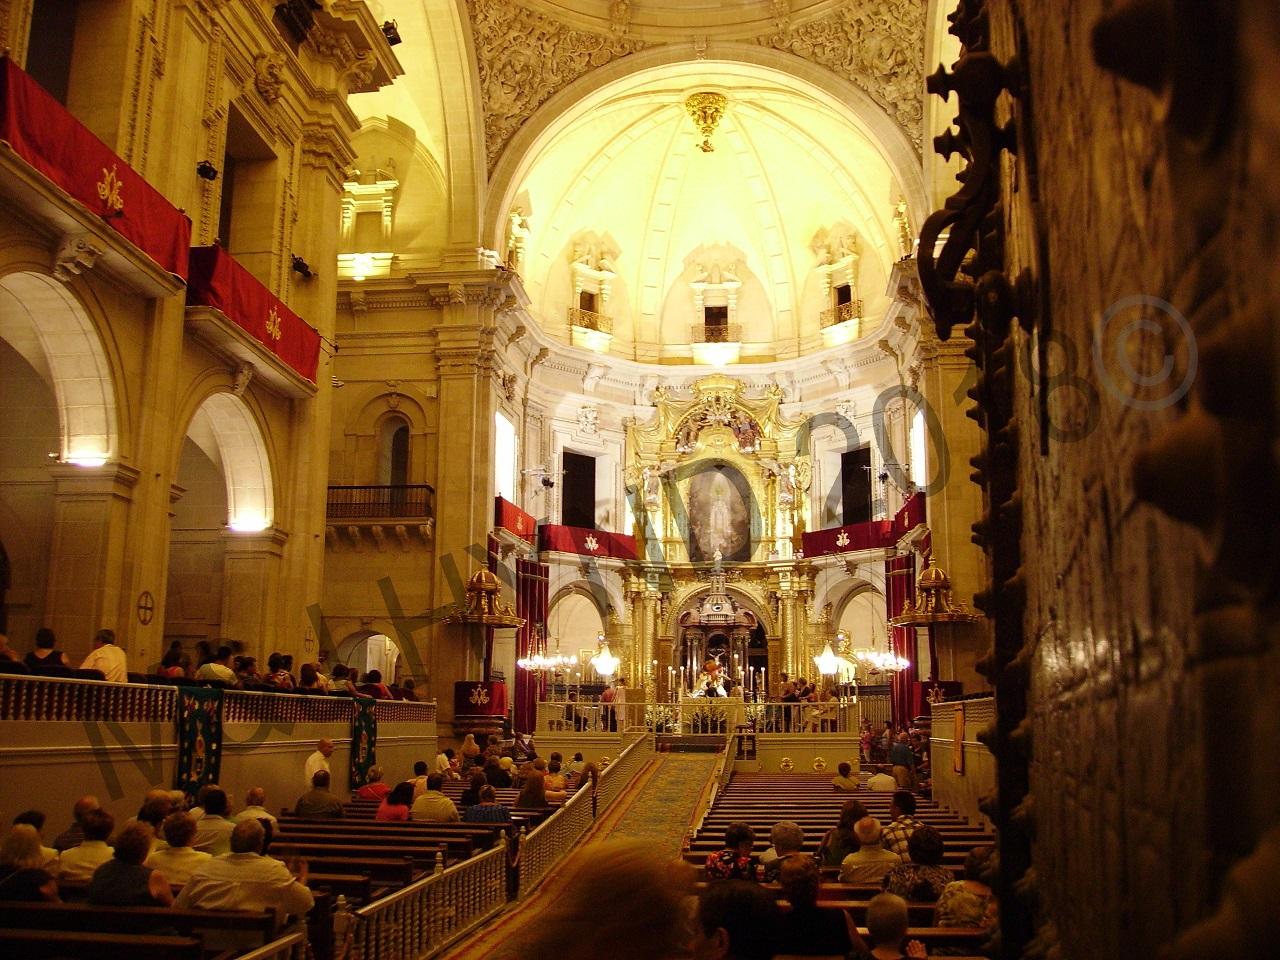 'Elche Mystery Play', Basilica de Santa Maria